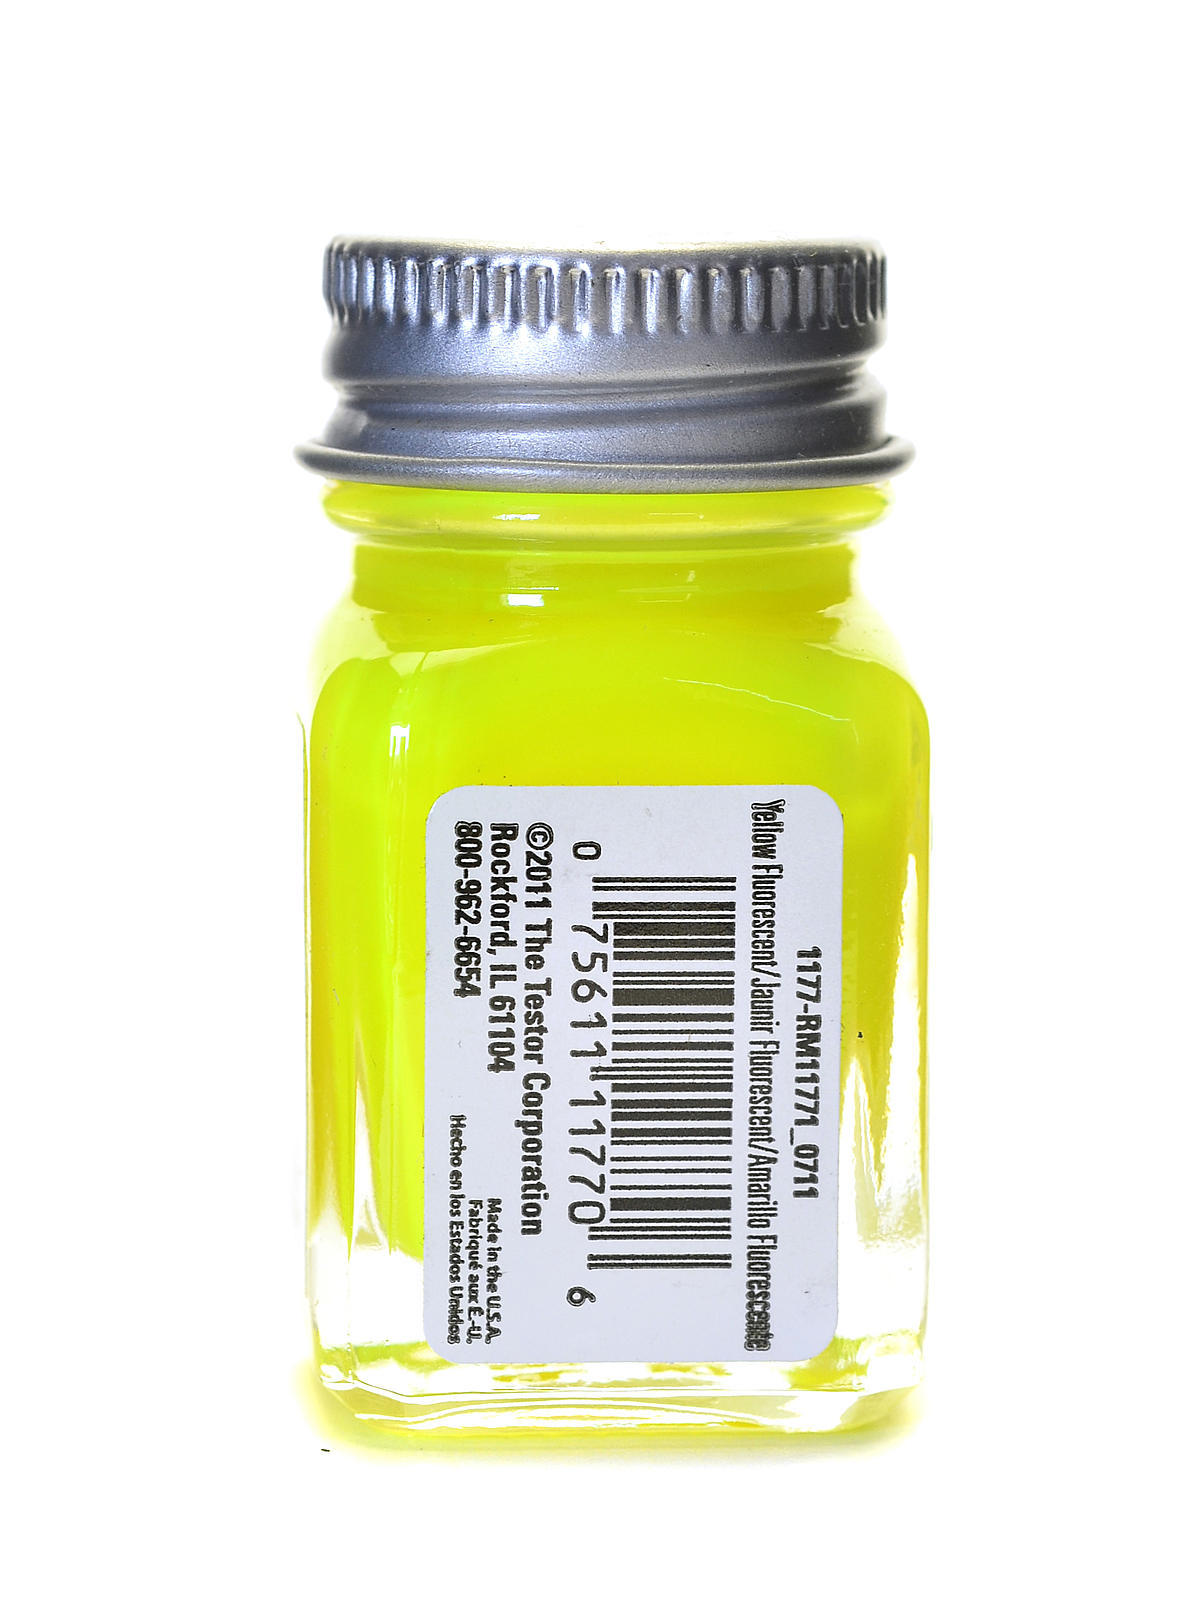 Testors: Fluorescent Enamel Paint - Yellow image